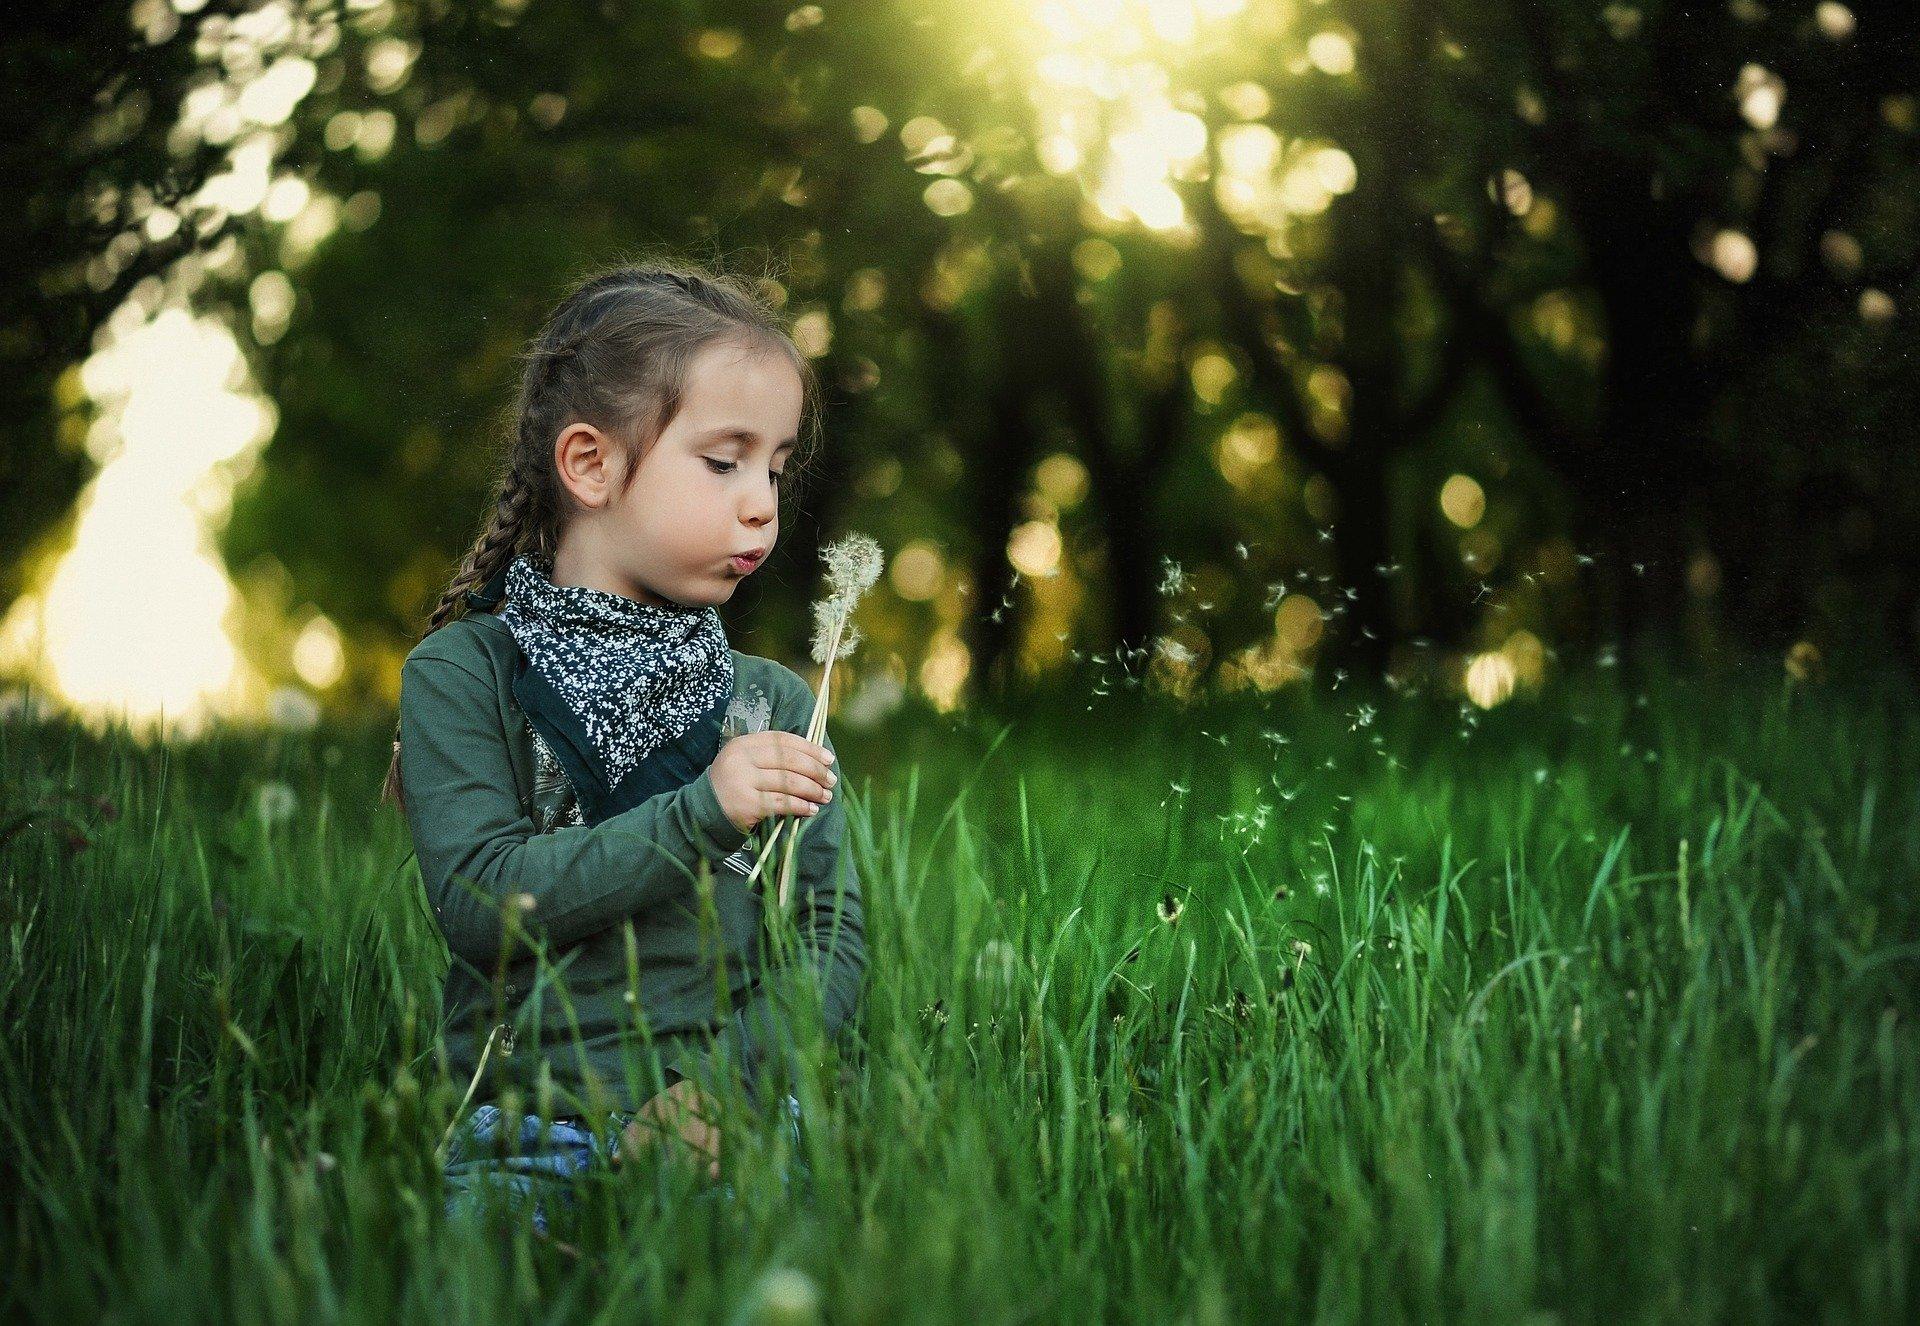 En primavera rebrota la conjuntivitis alérgica